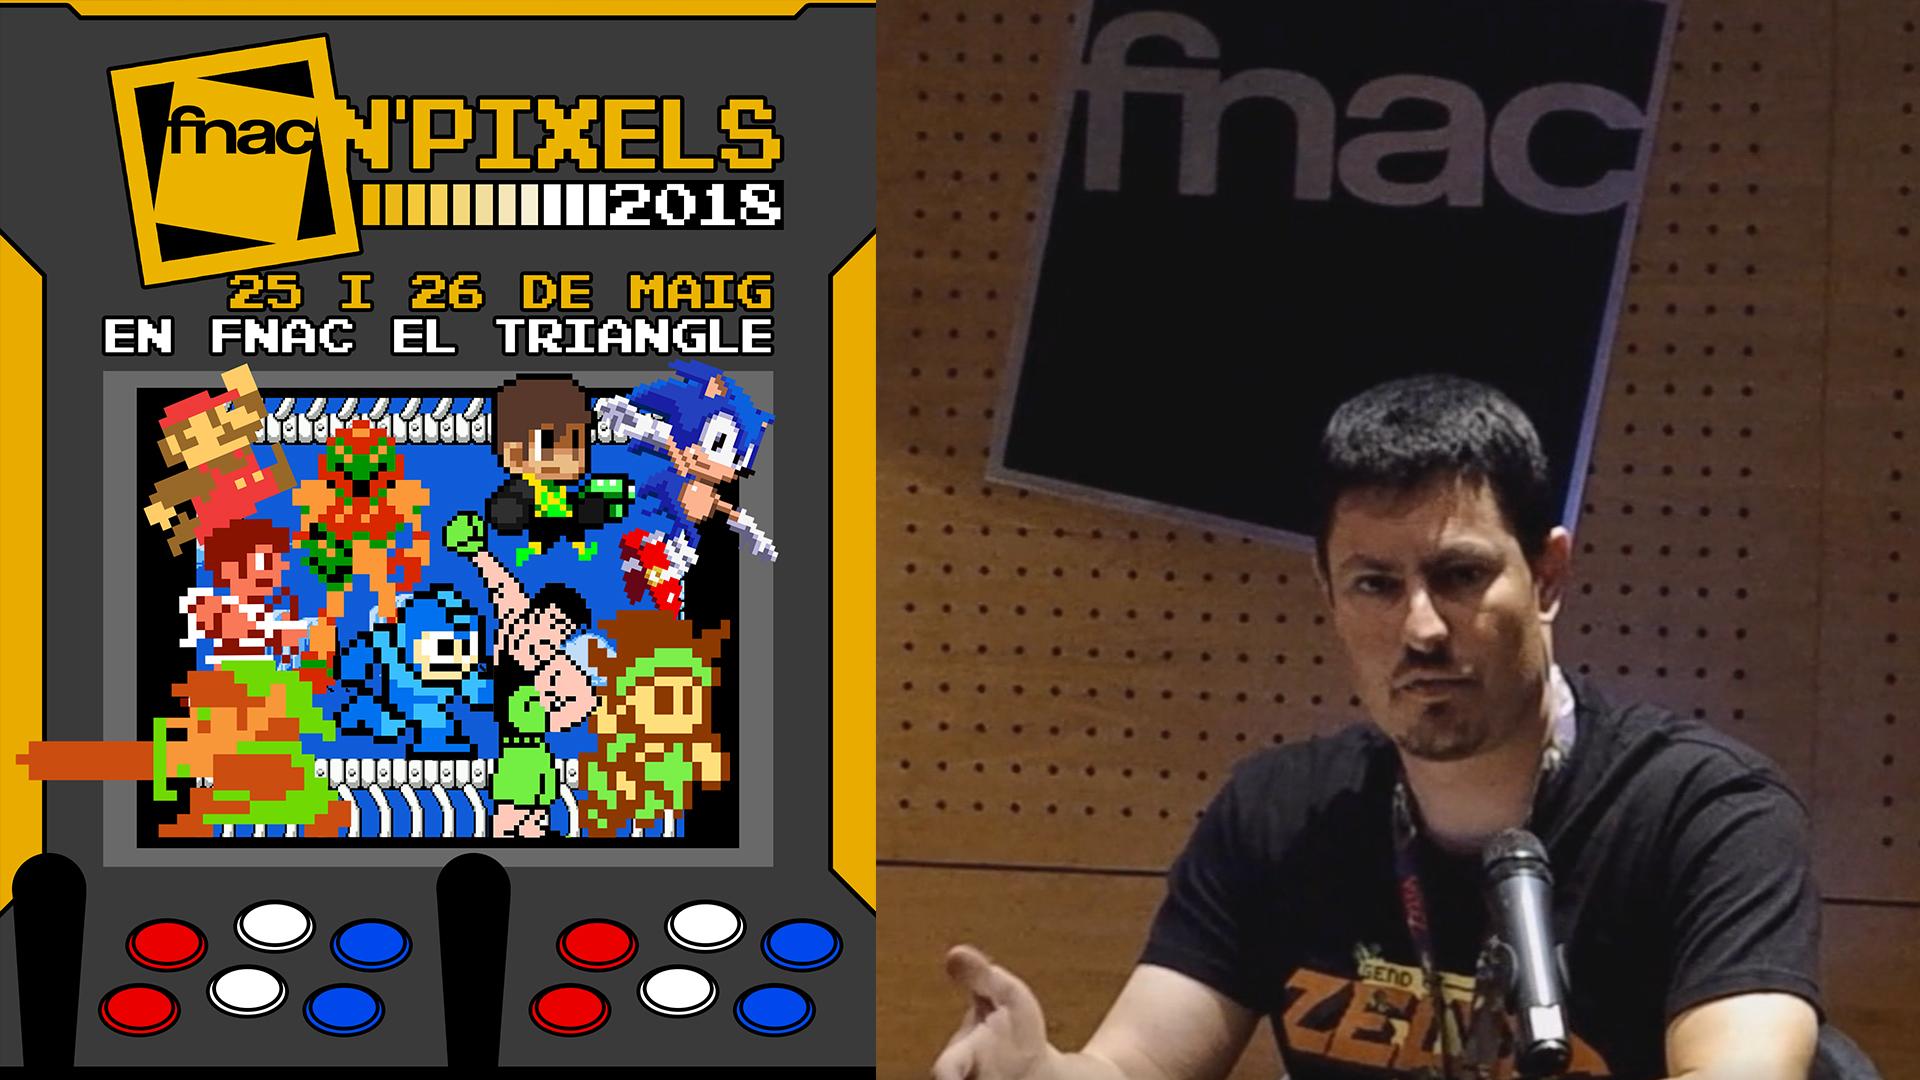 Universo Zelda desde Fnac'n'Pixels 2018